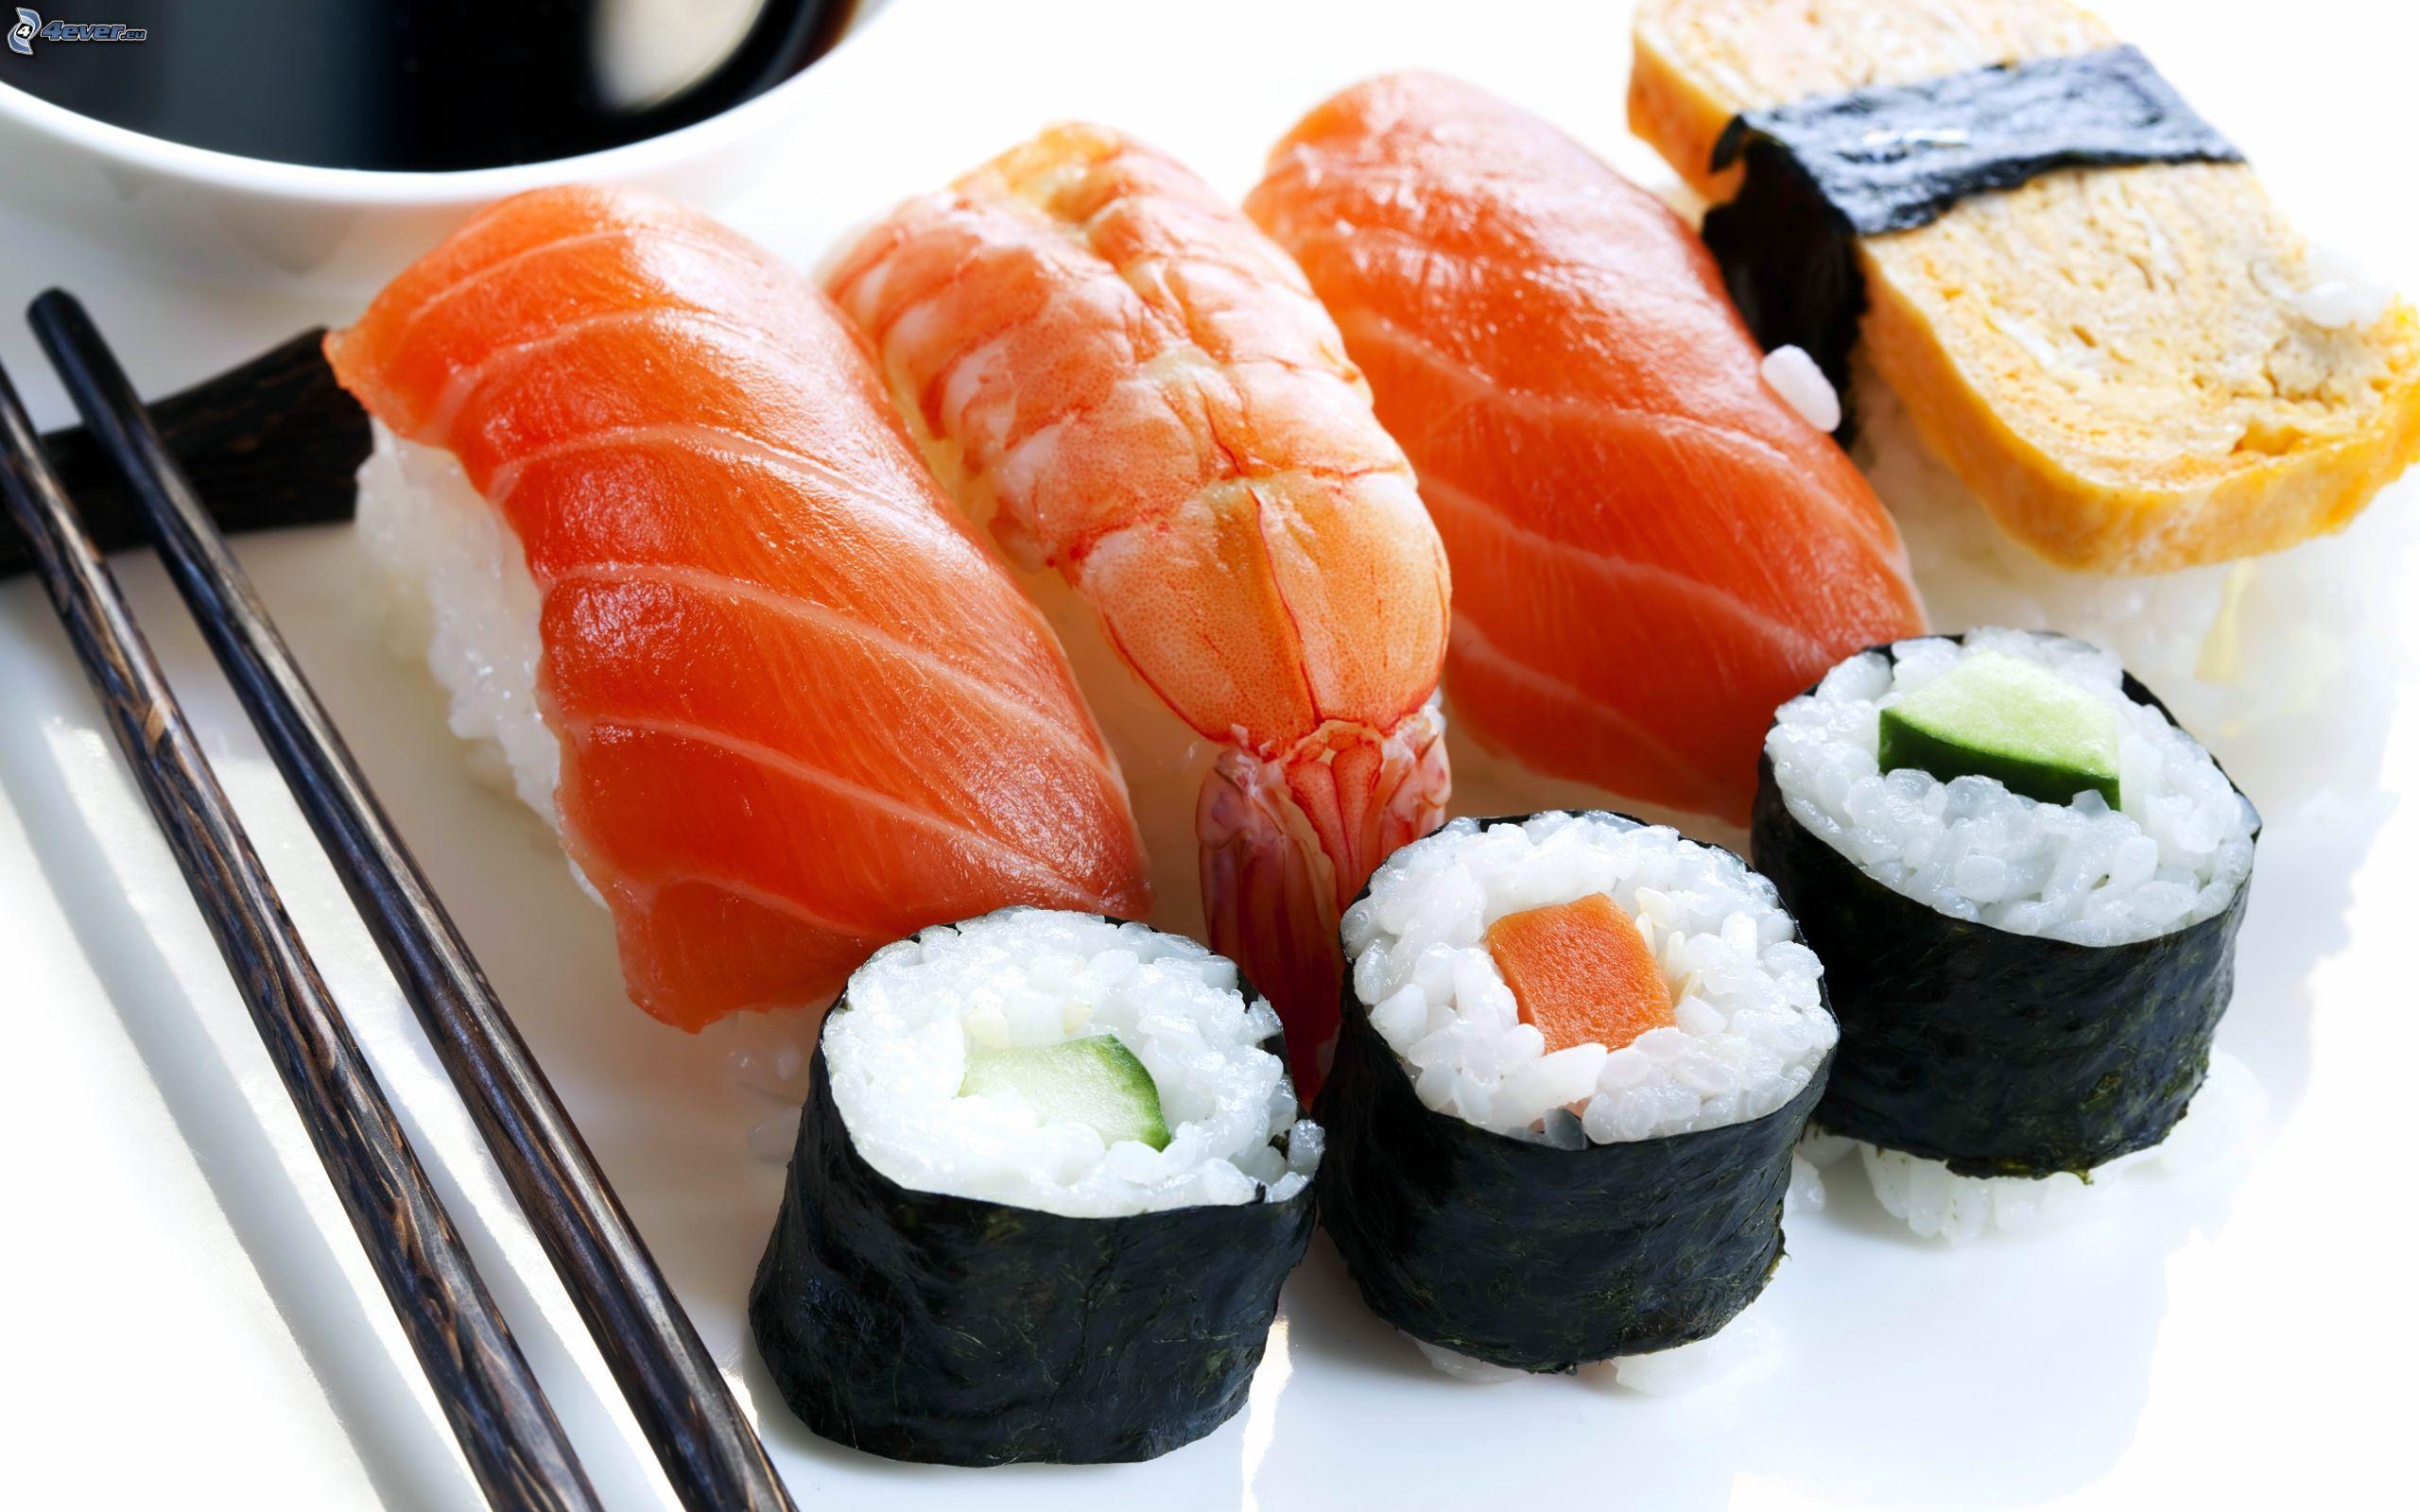 Se mangi sushi vivi più a lungo